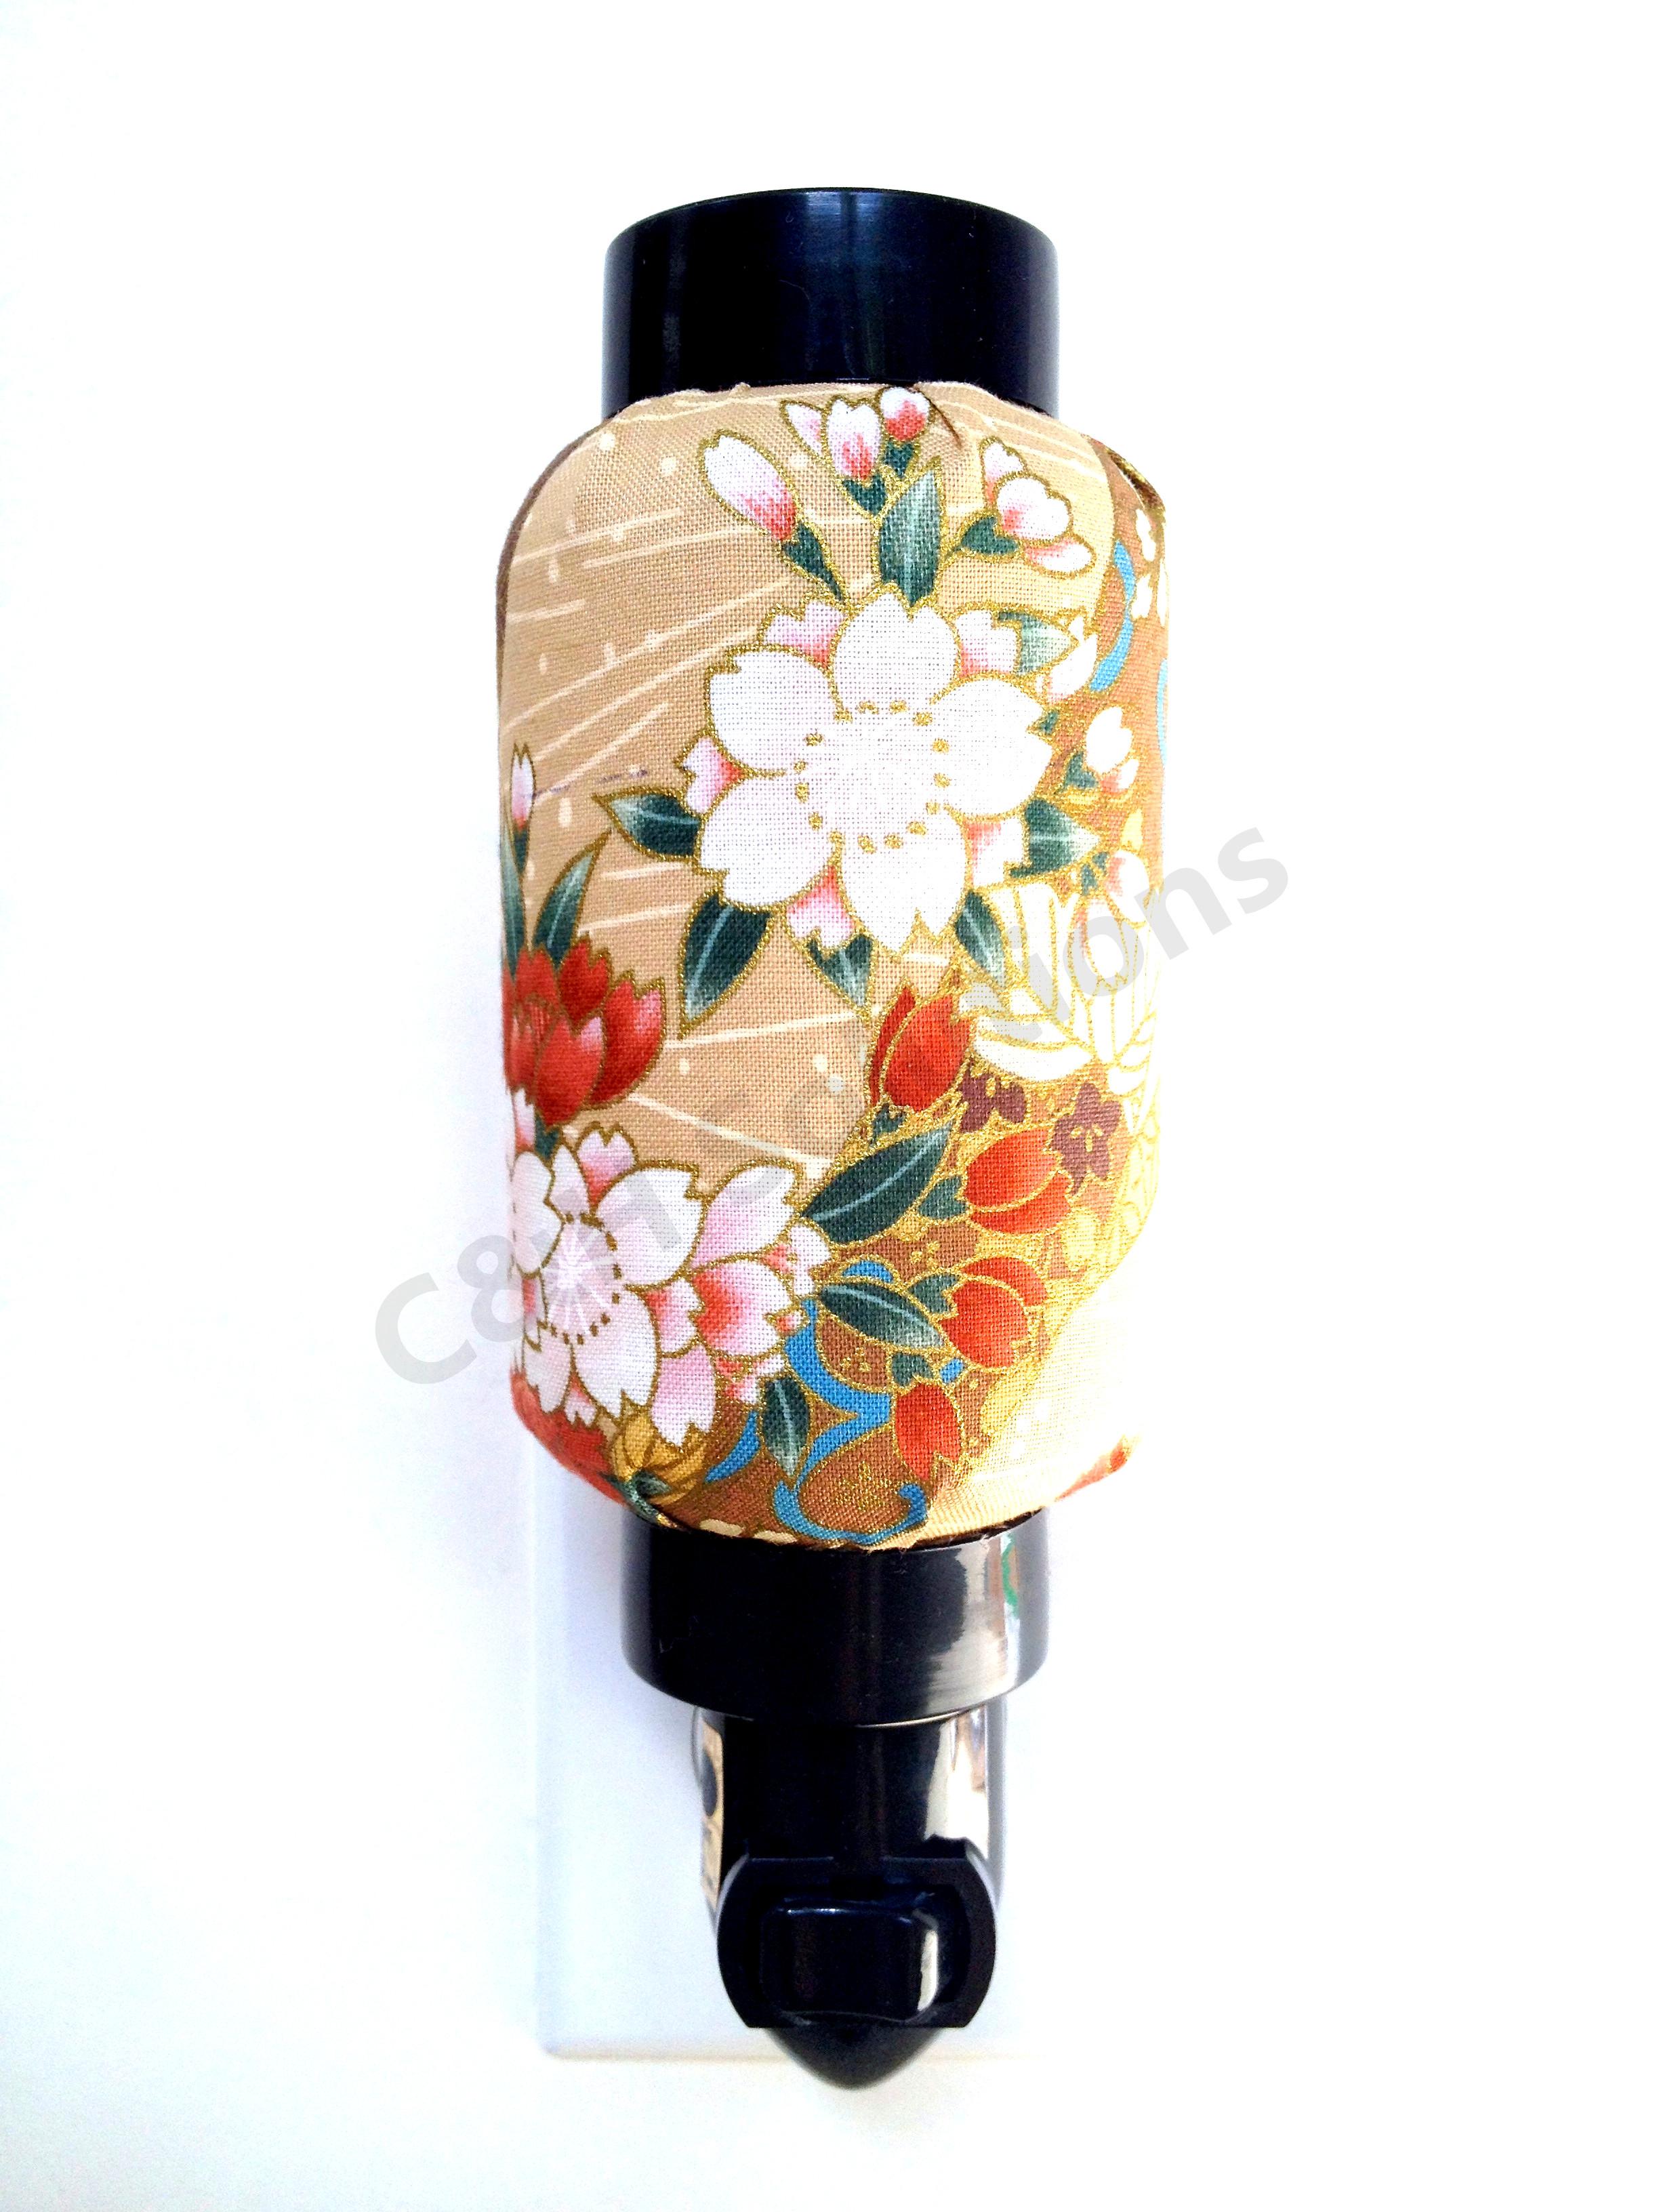 Eastern Classical Flower Japanese Oriental Style Decorative Night Light